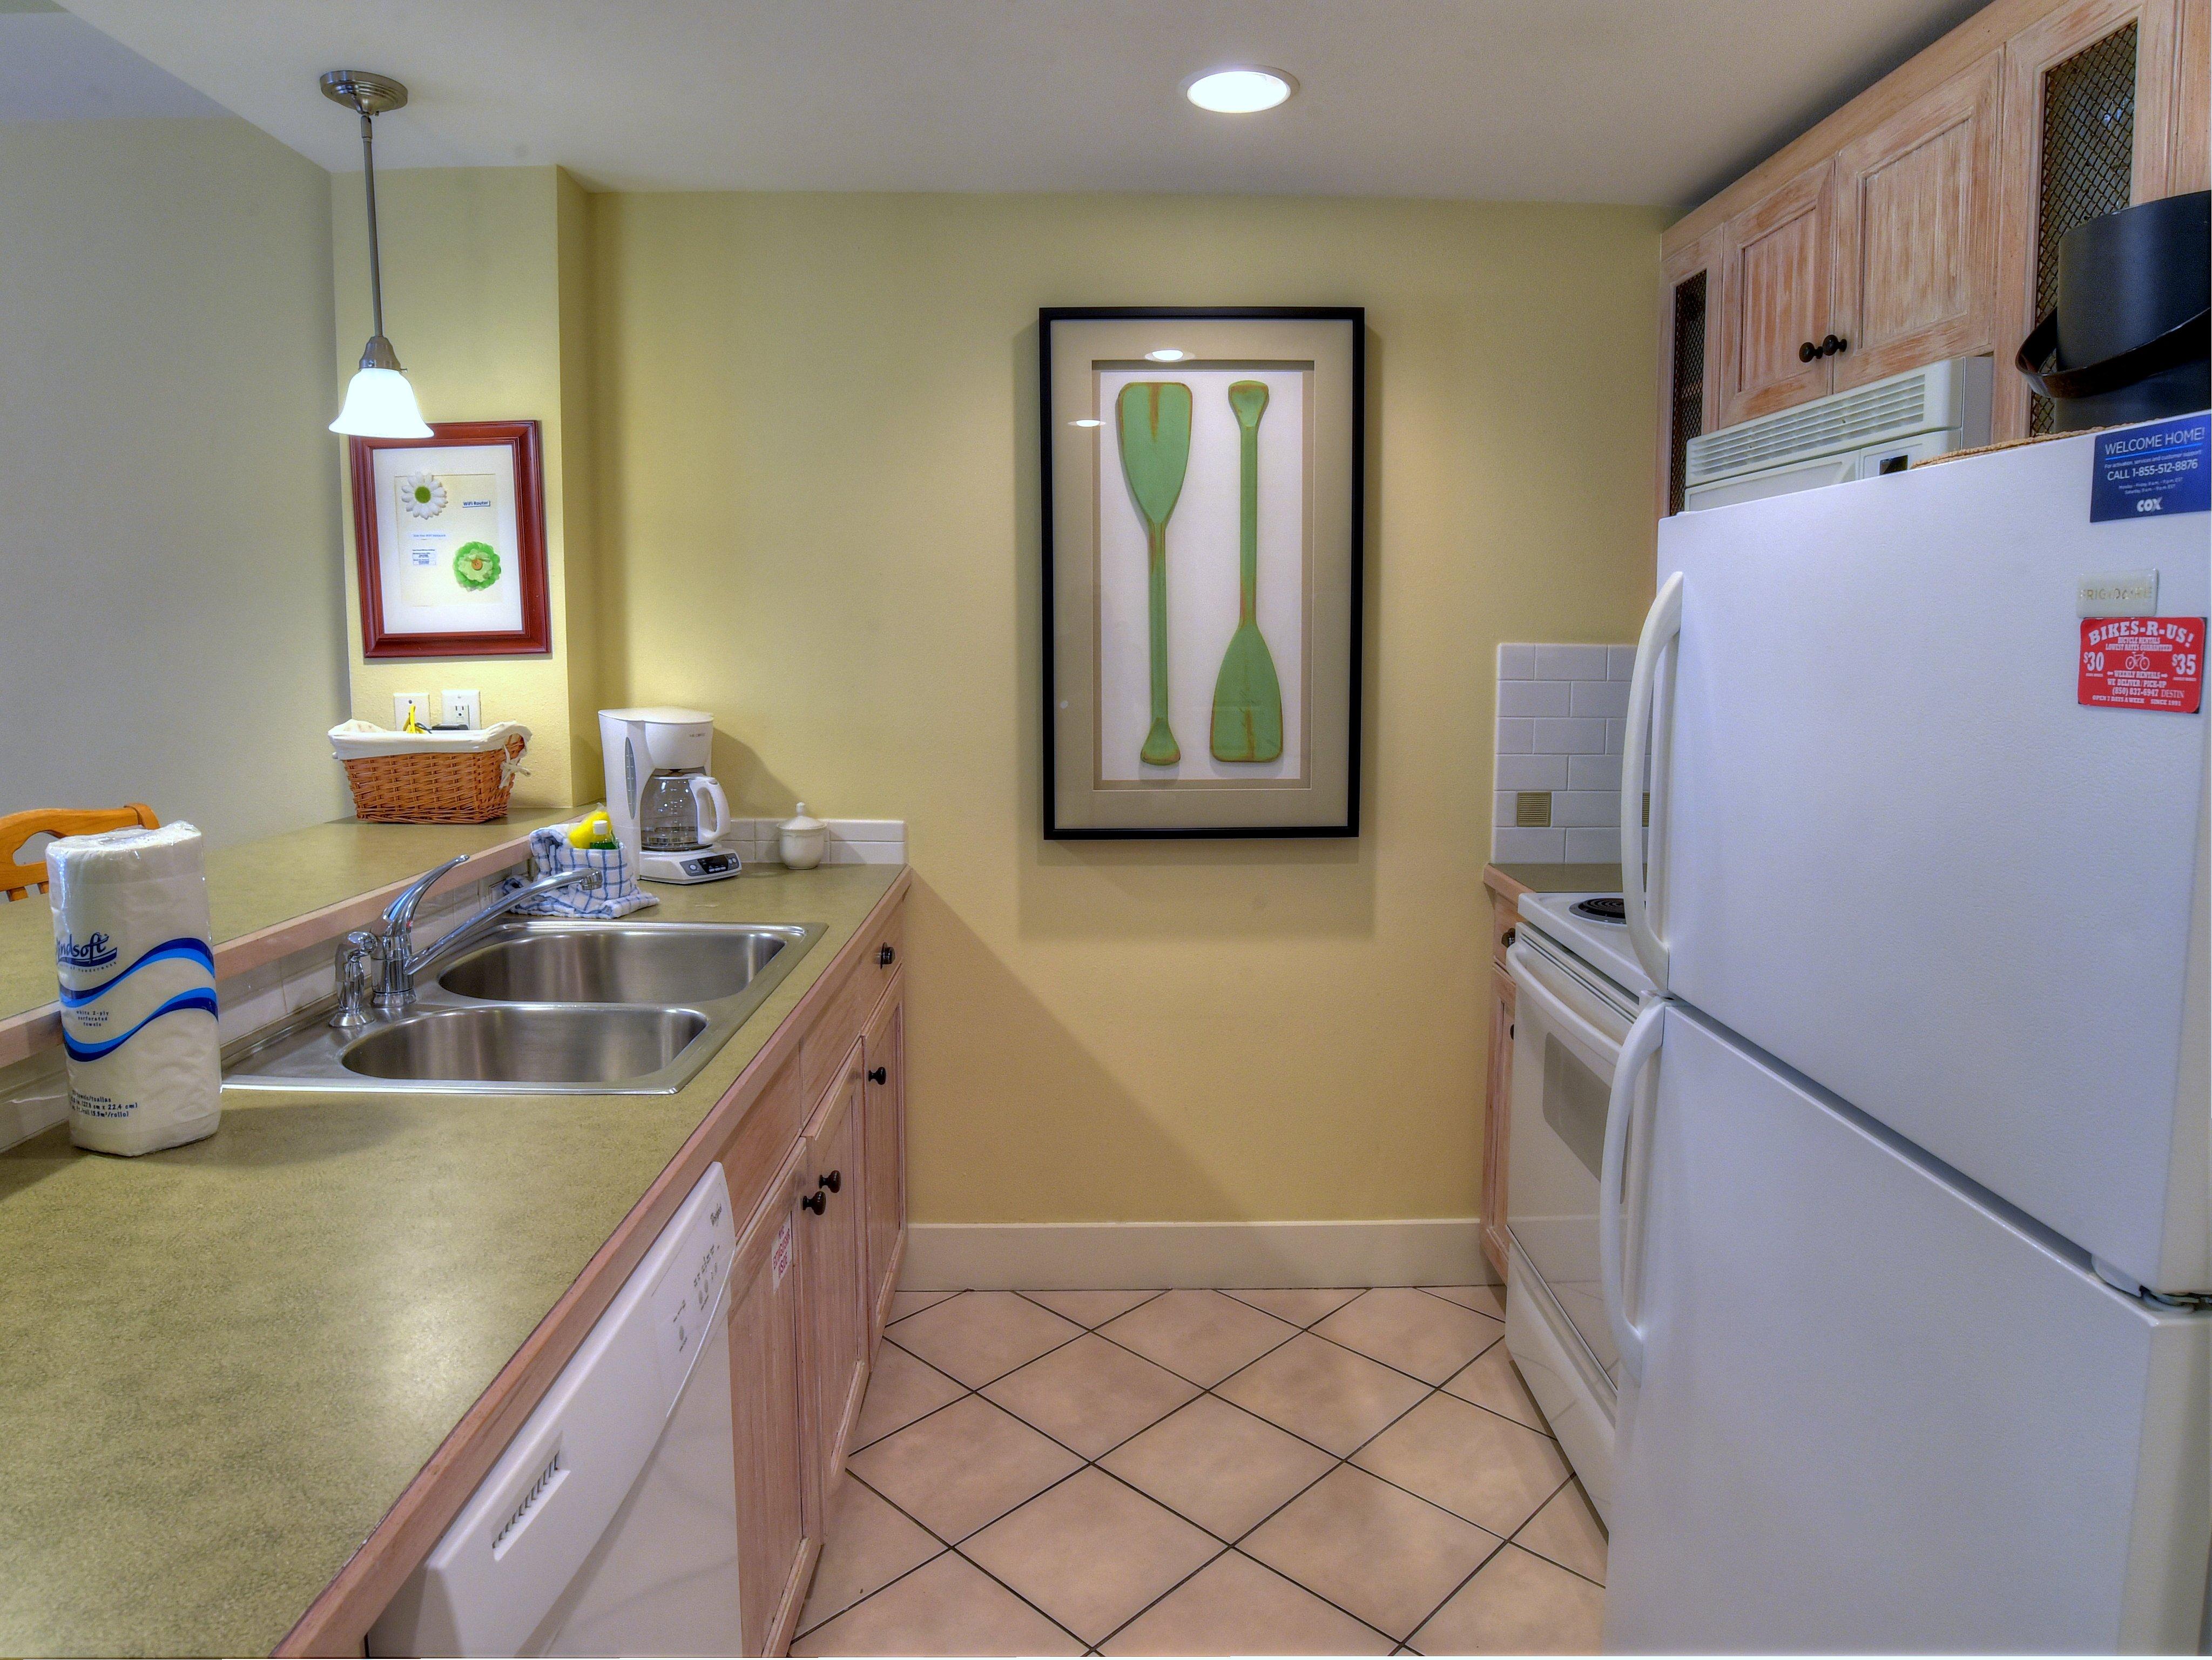 205 Pilot House Condo rental in Pilot House at Sandestin in Destin Florida - #9